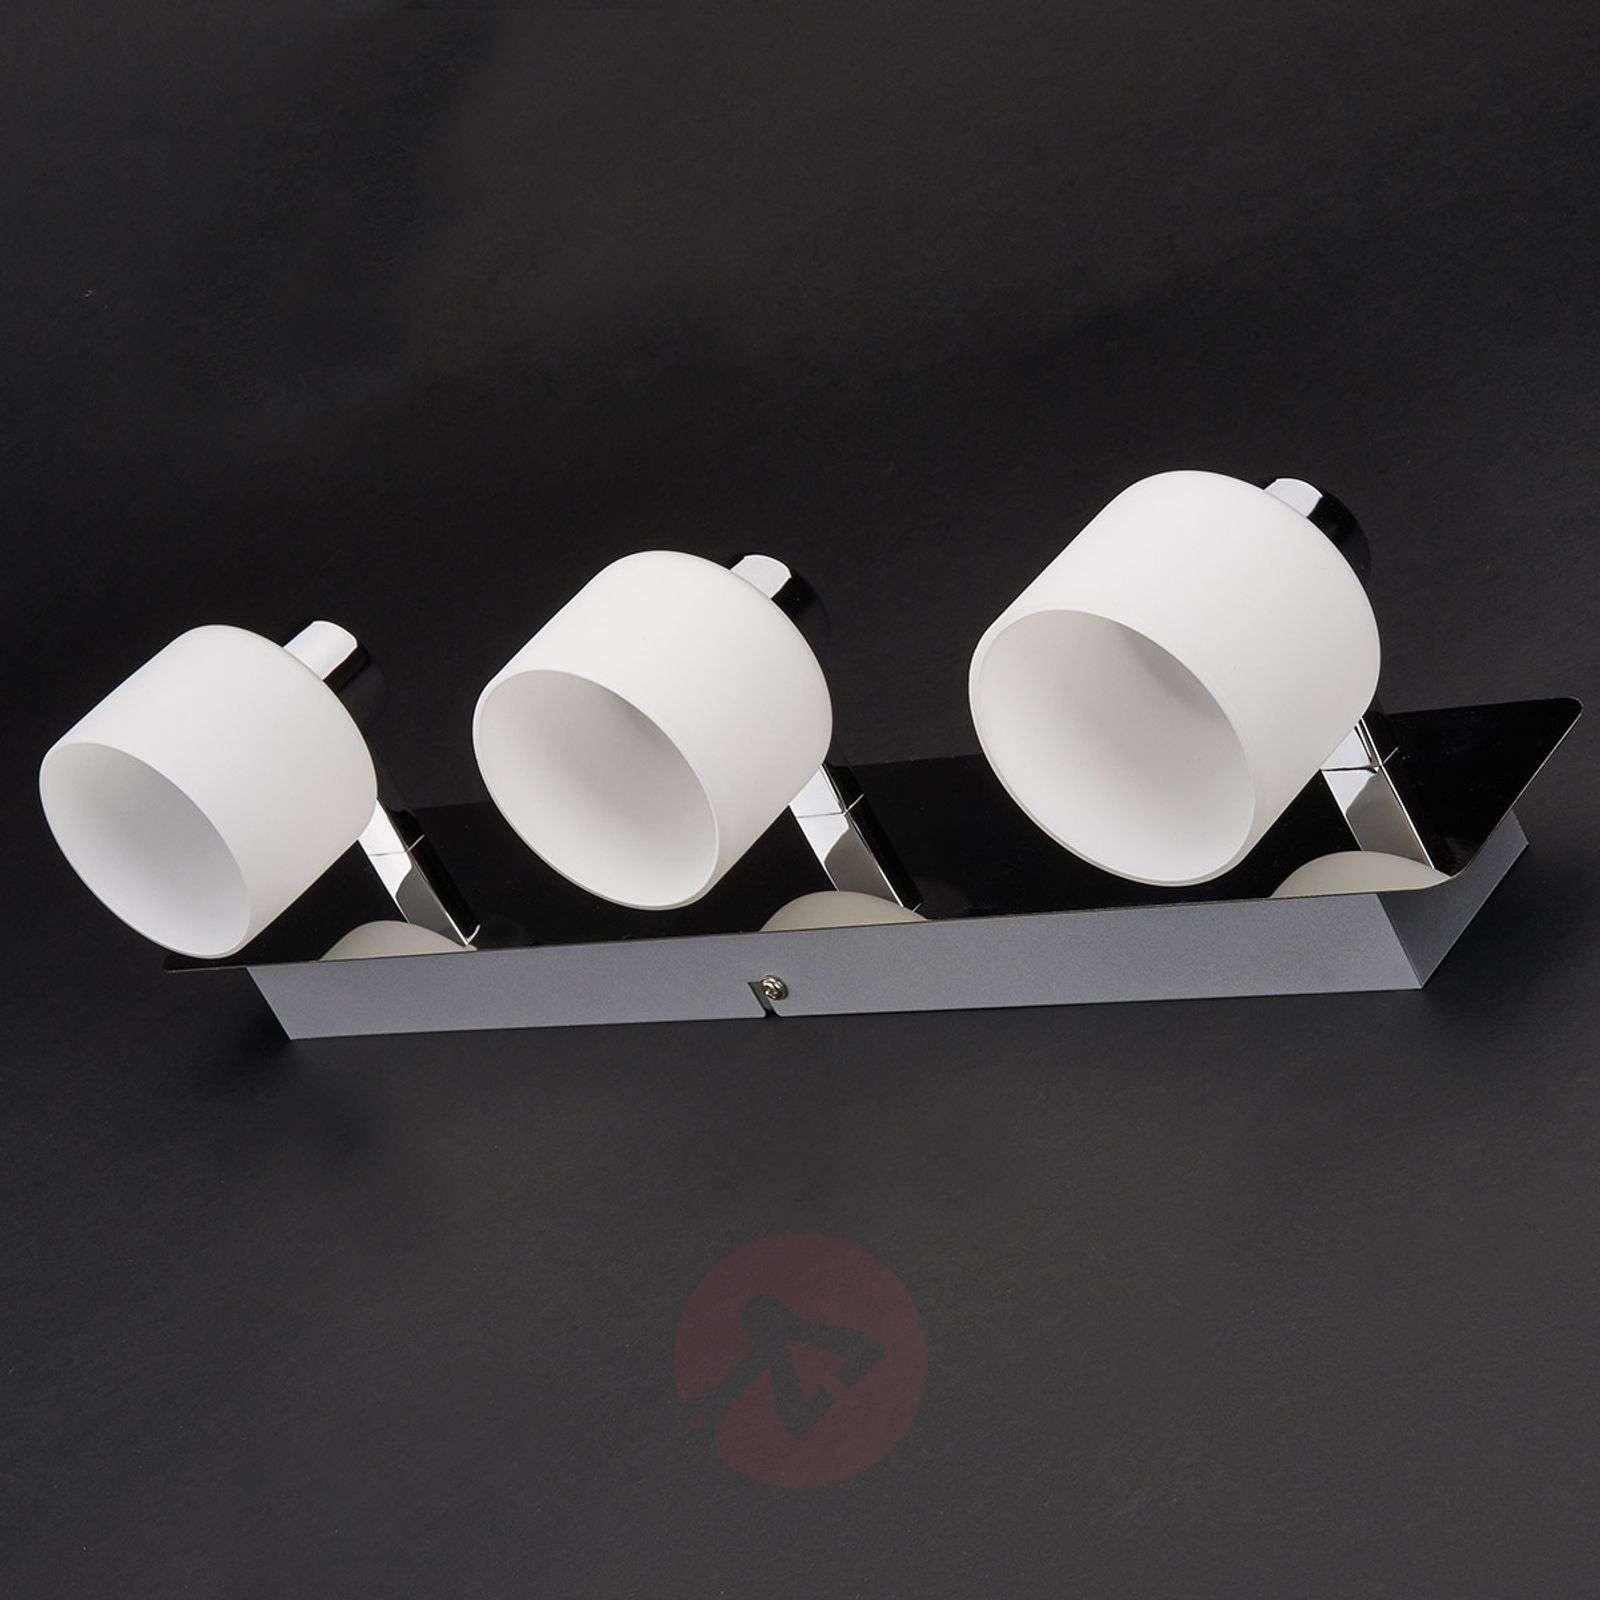 3-light LED wall lamp Emira-9994045-01